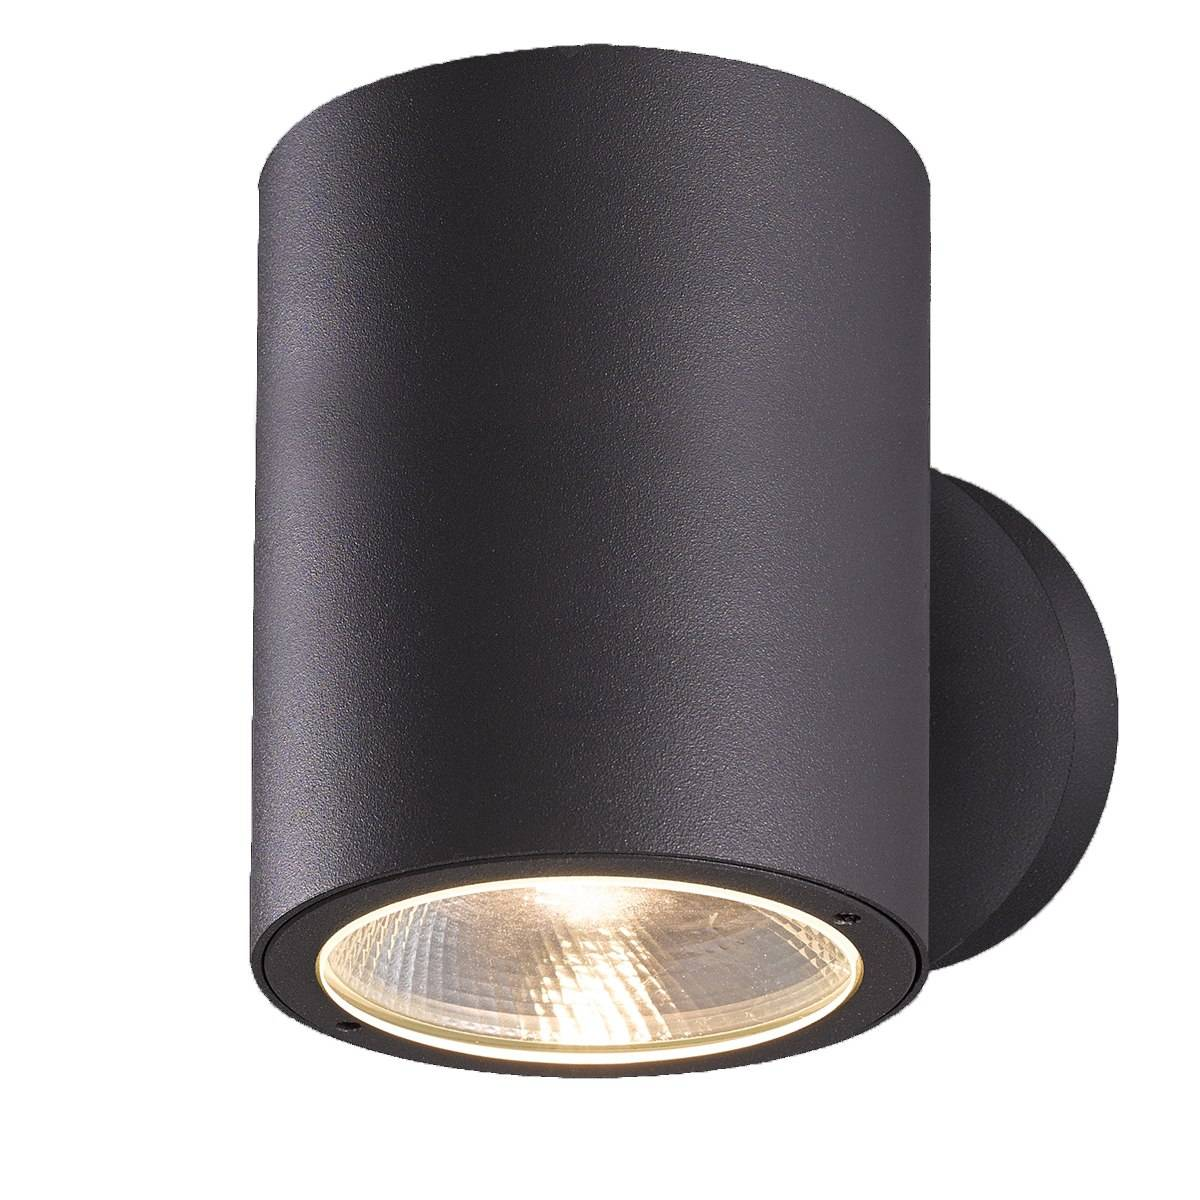 Eurofase - Outdoor LED - Outdoor Lighting